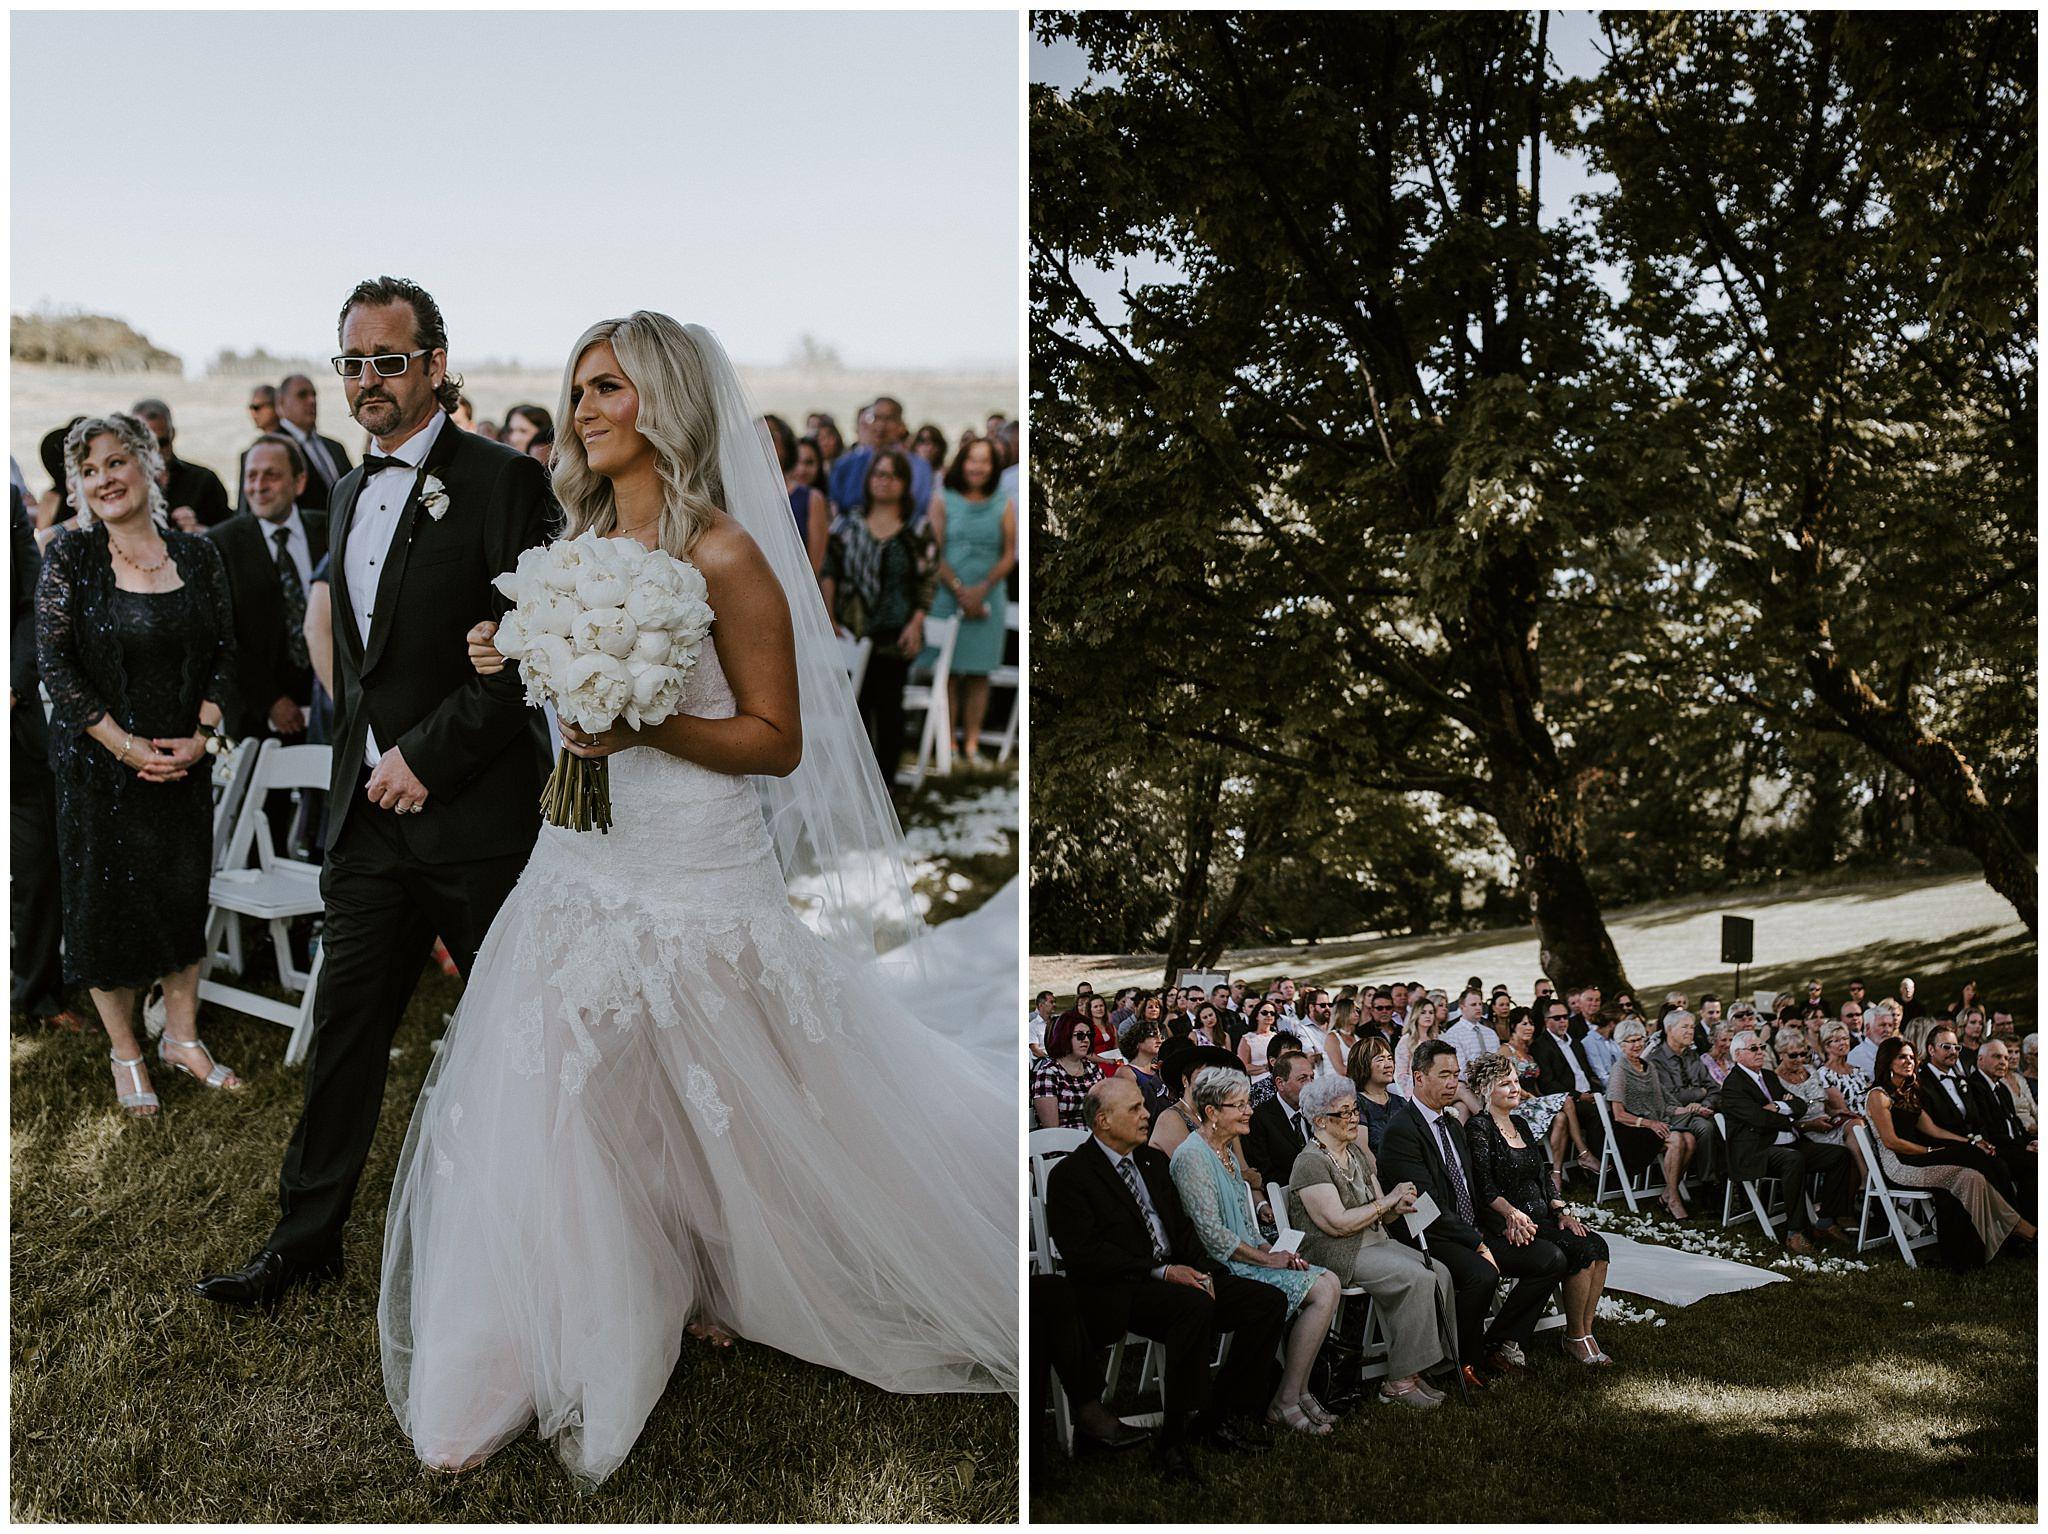 mt-lehman-winery-wedding-abbotsford-35.JPG